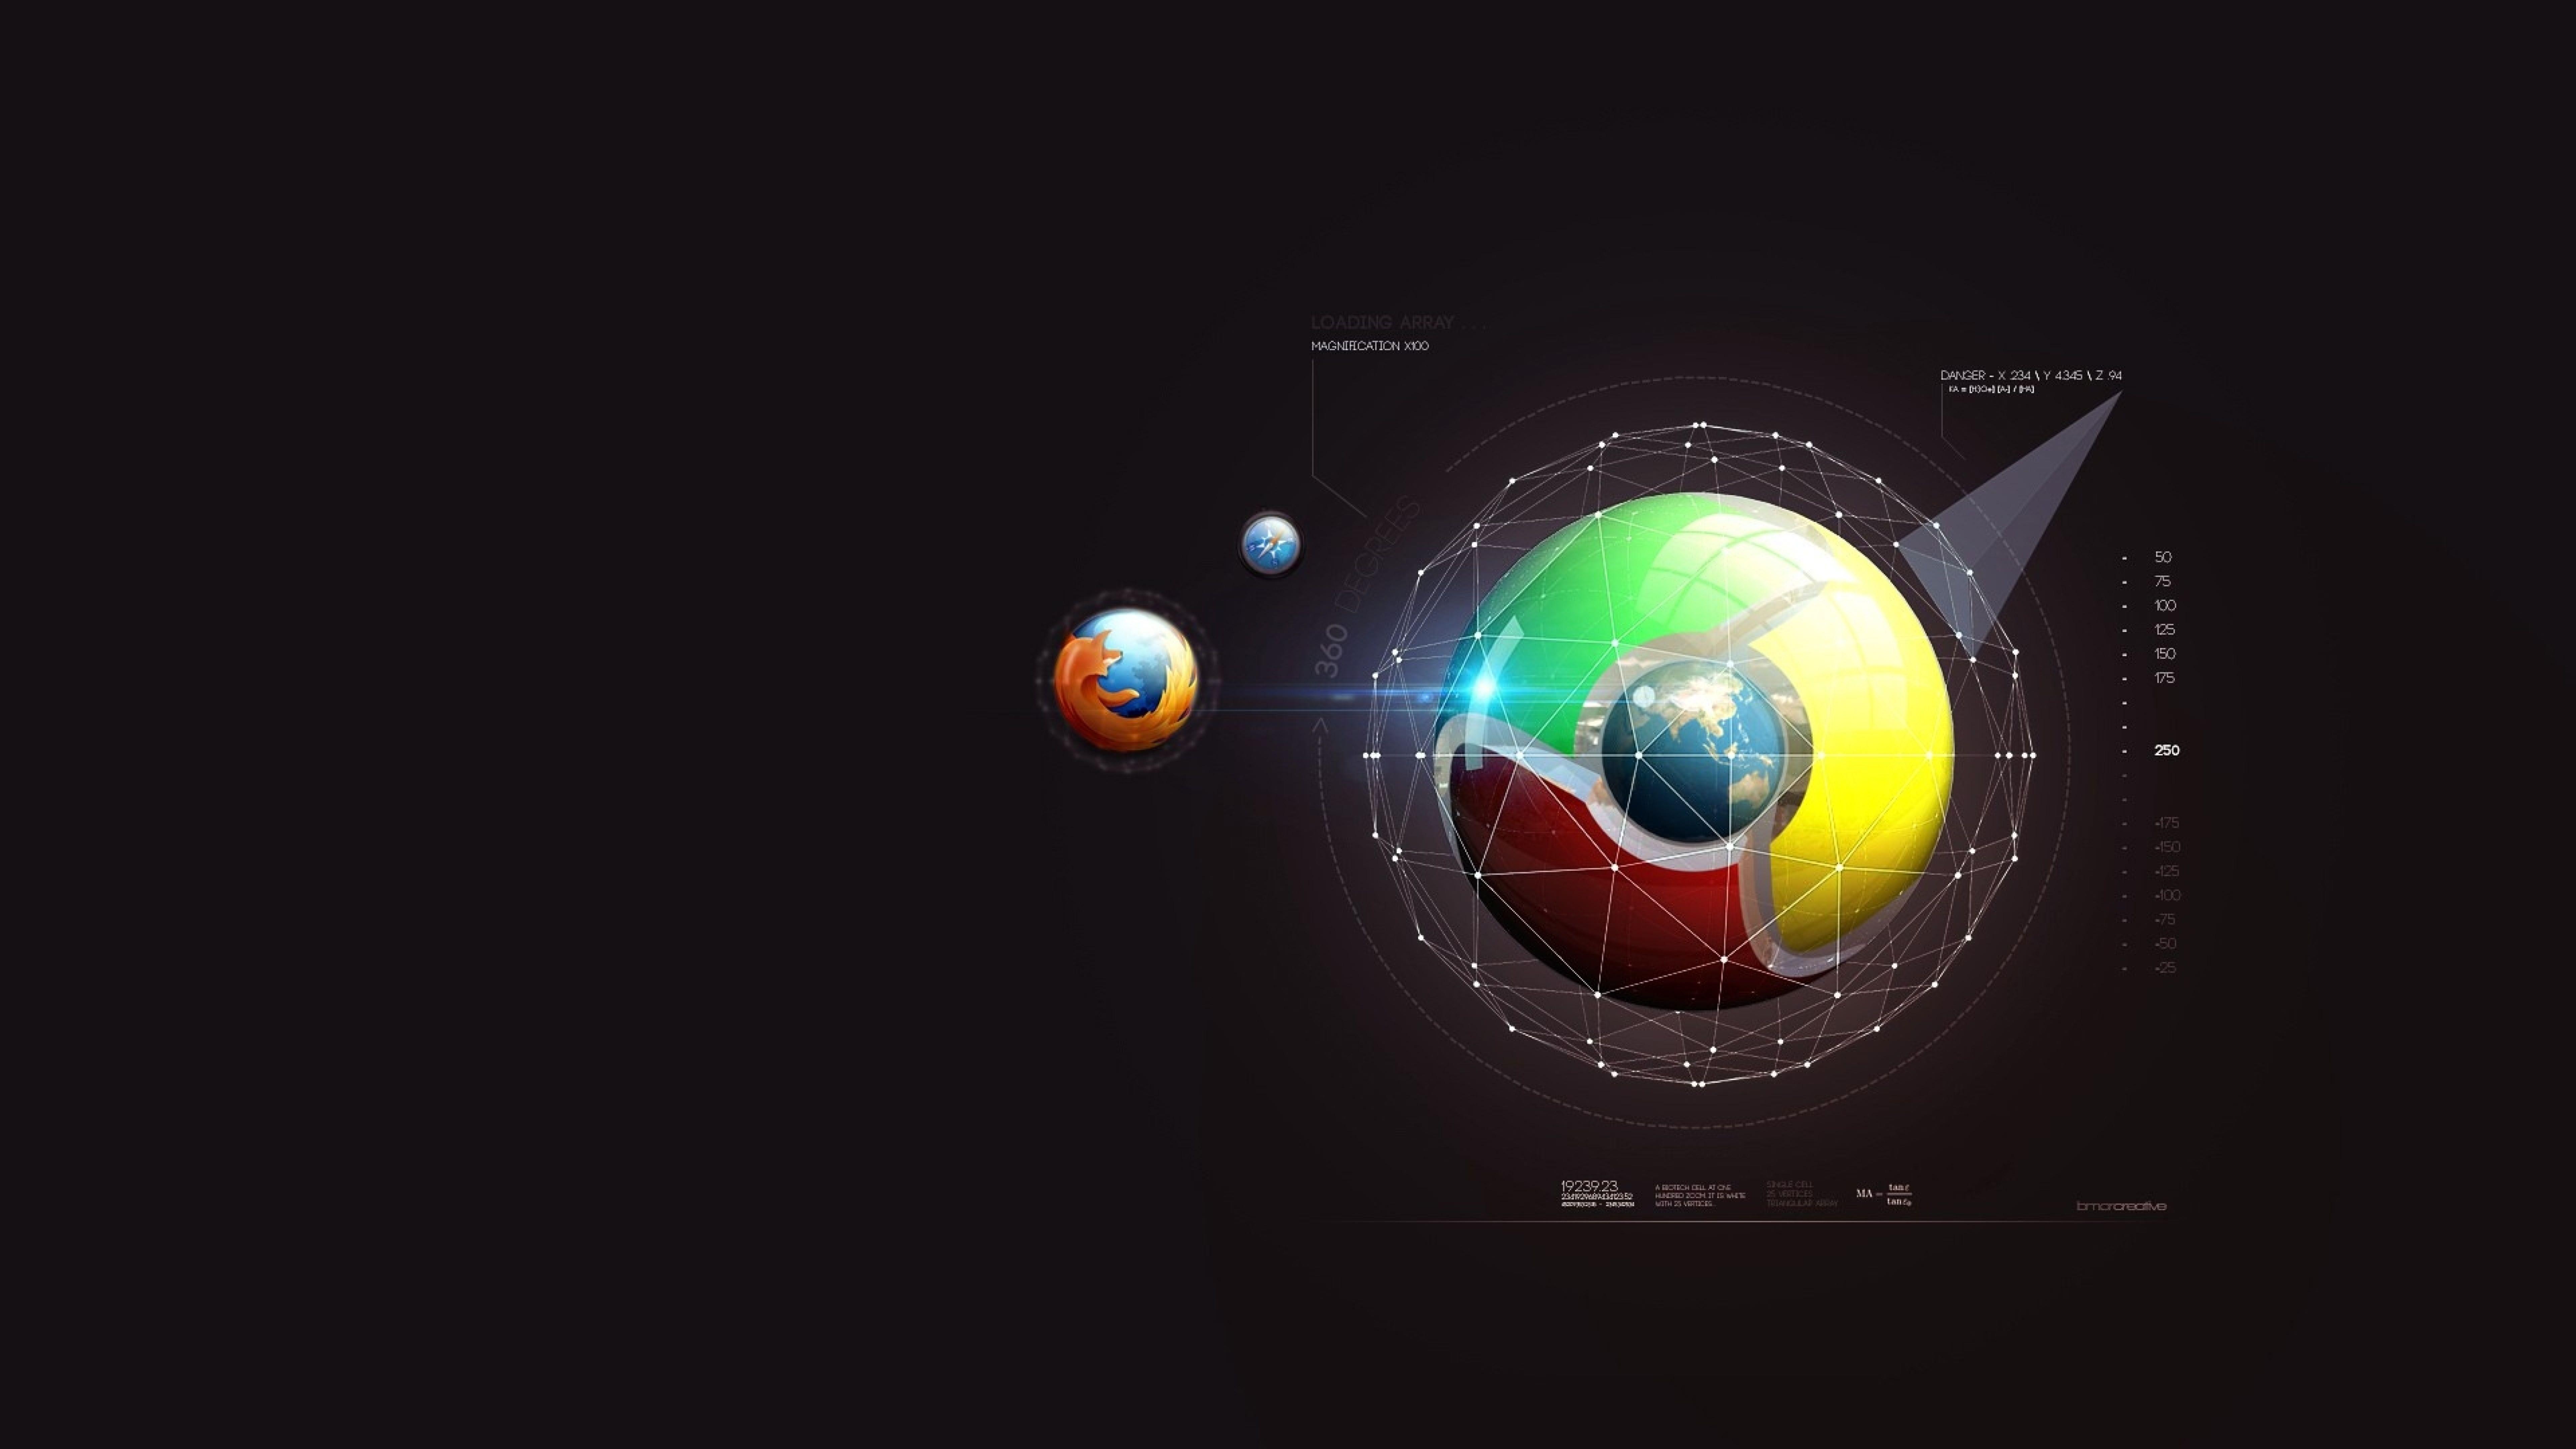 Epic 8k Sphere Google Circle Google Chrome Firefox Wallpapers Chrome Wallpaper Hi Tech Wallpaper System Wallpaper